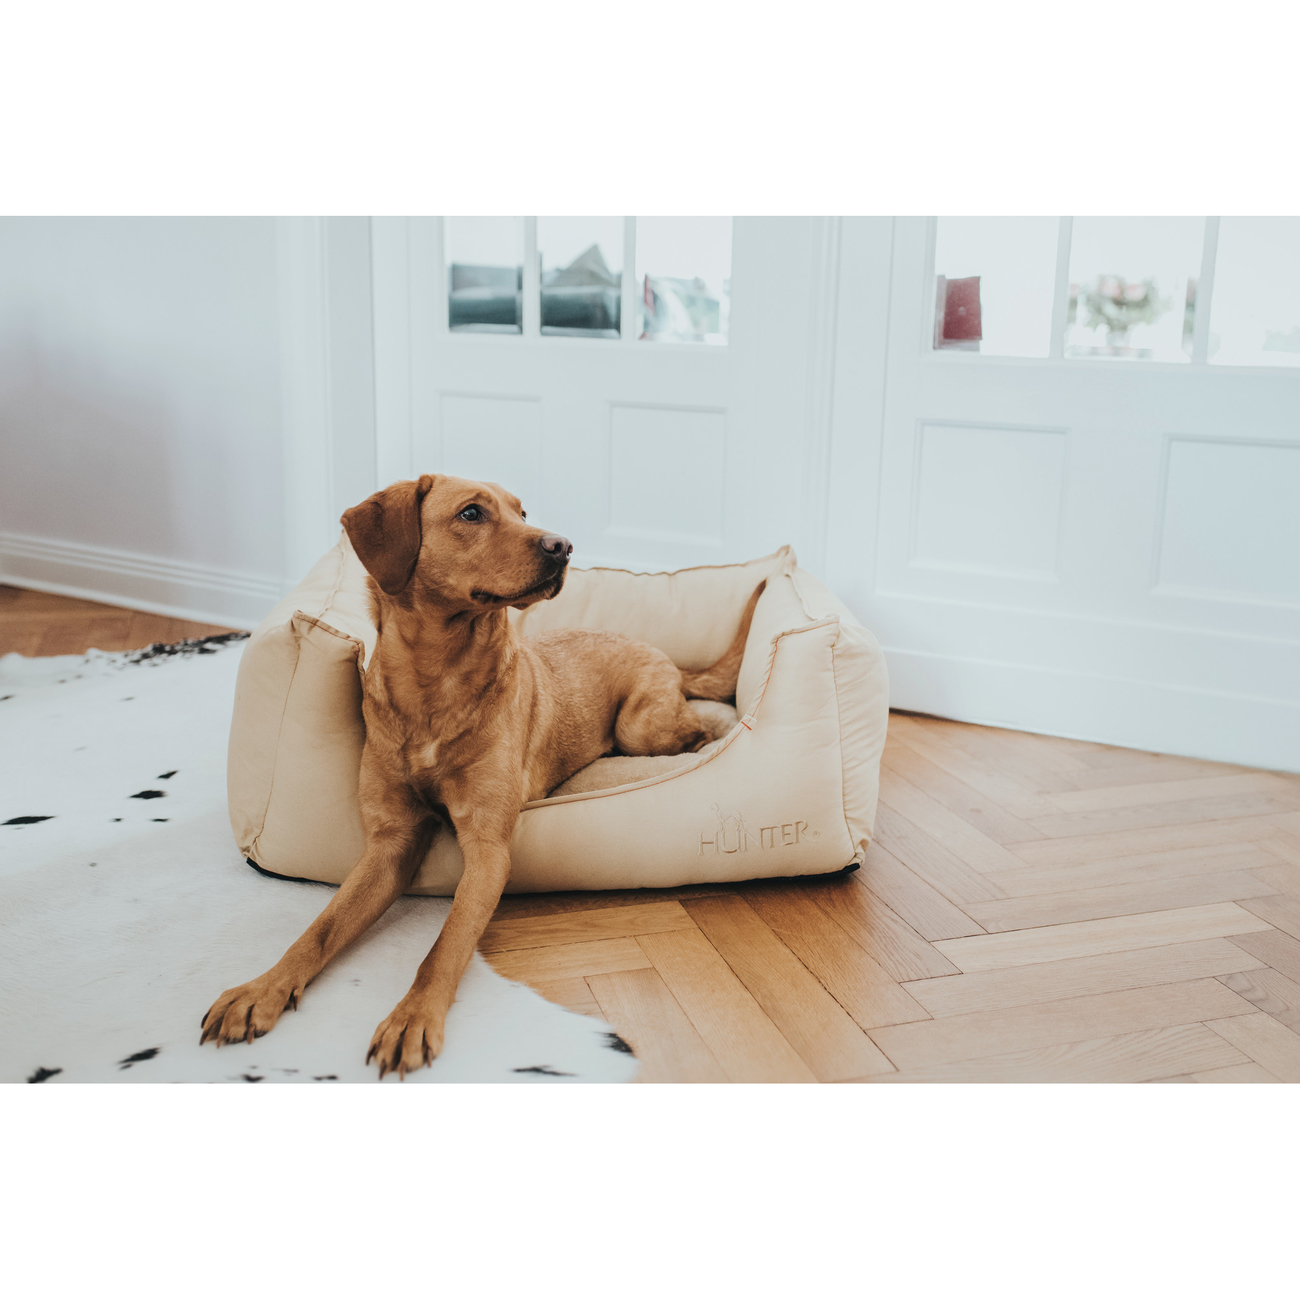 Hunter Hundesofa Sanremo 65105, Bild 13